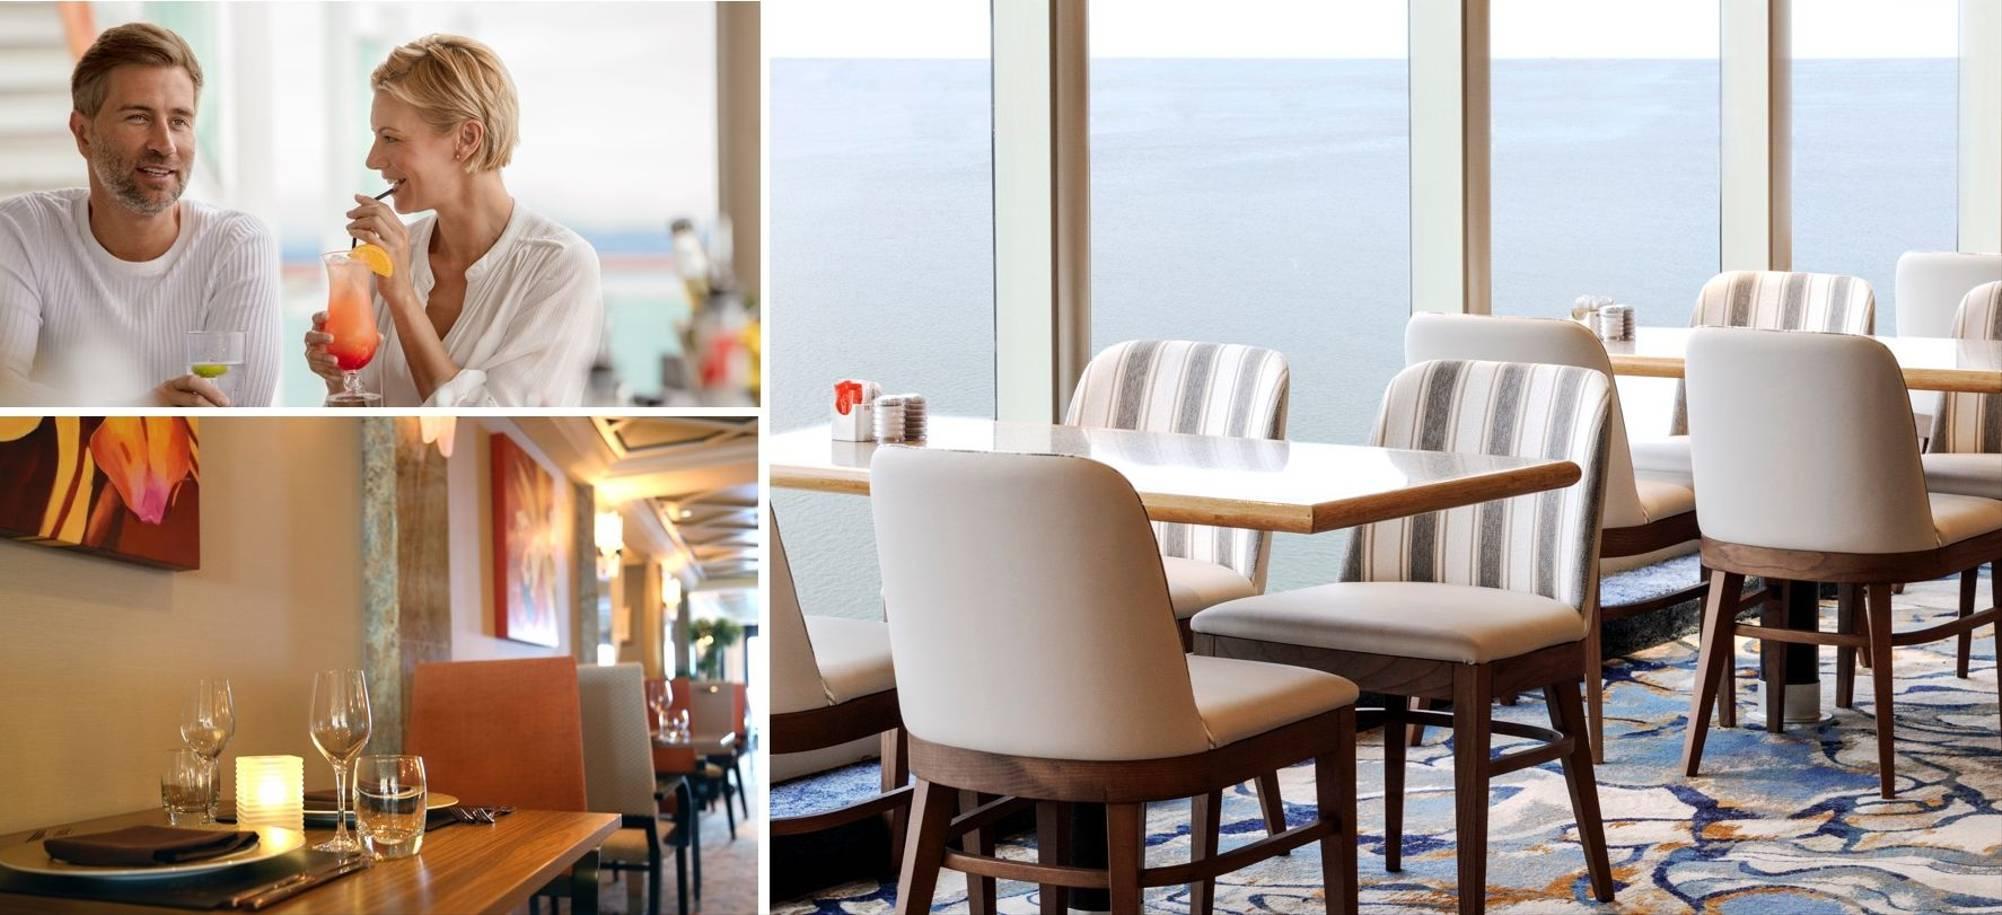 24-25 Day - At sea, Dining - Itinerary Desktop.jpg